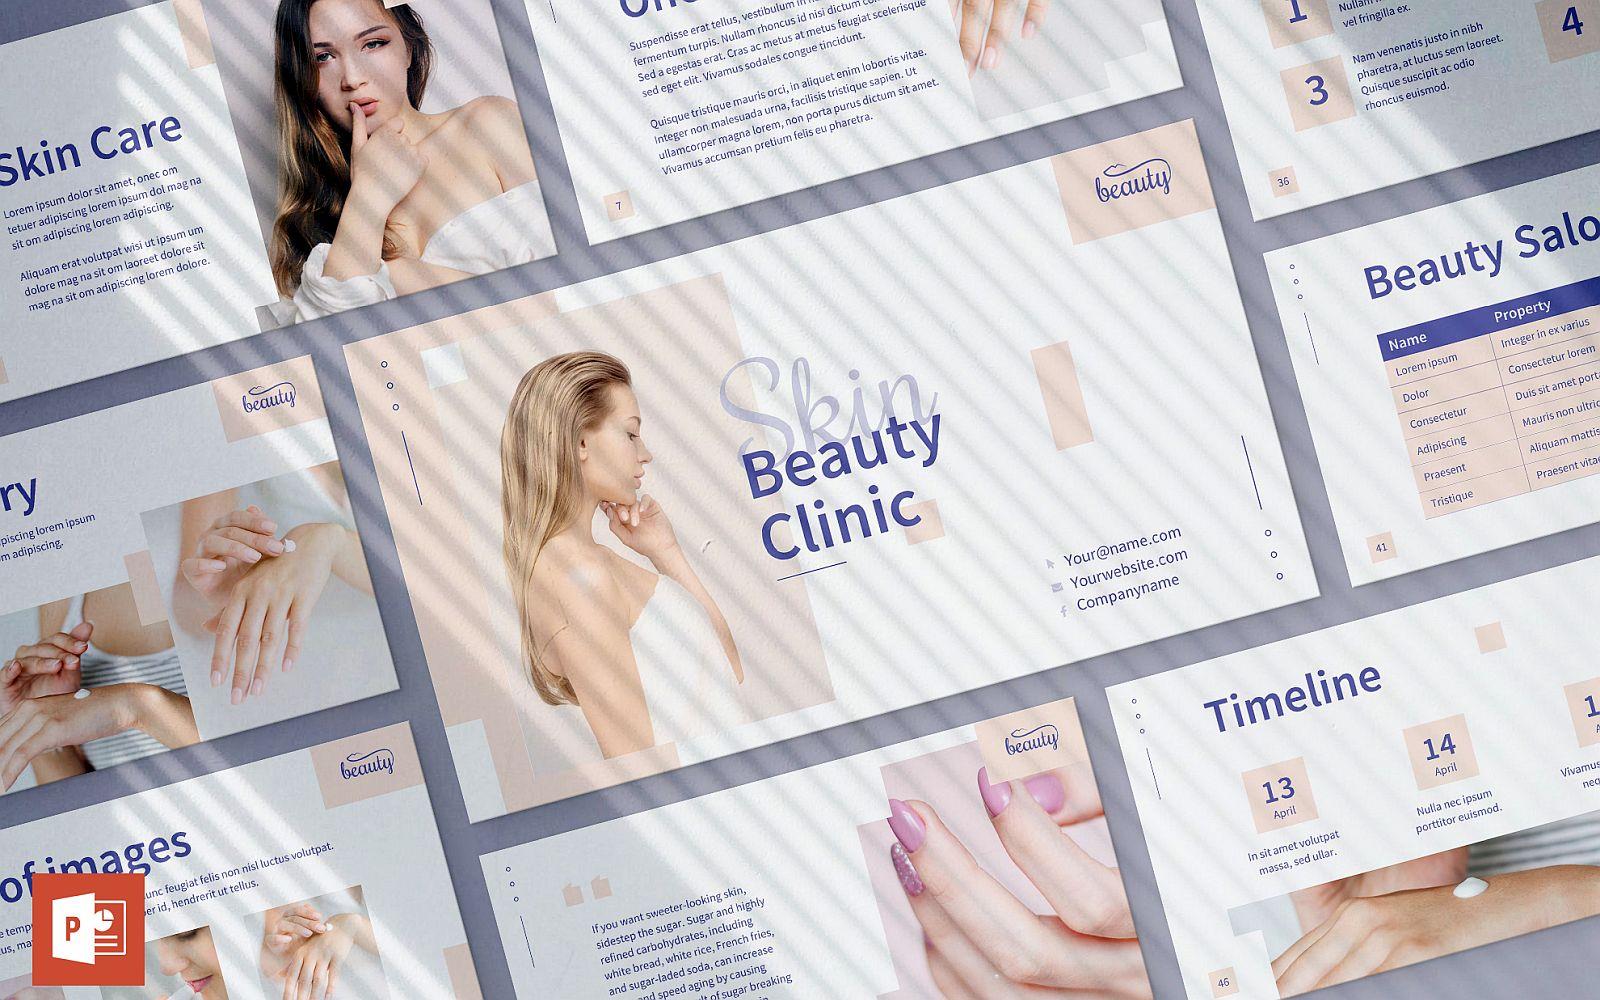 Skin Beauty Clinic Presentation PowerPoint Template